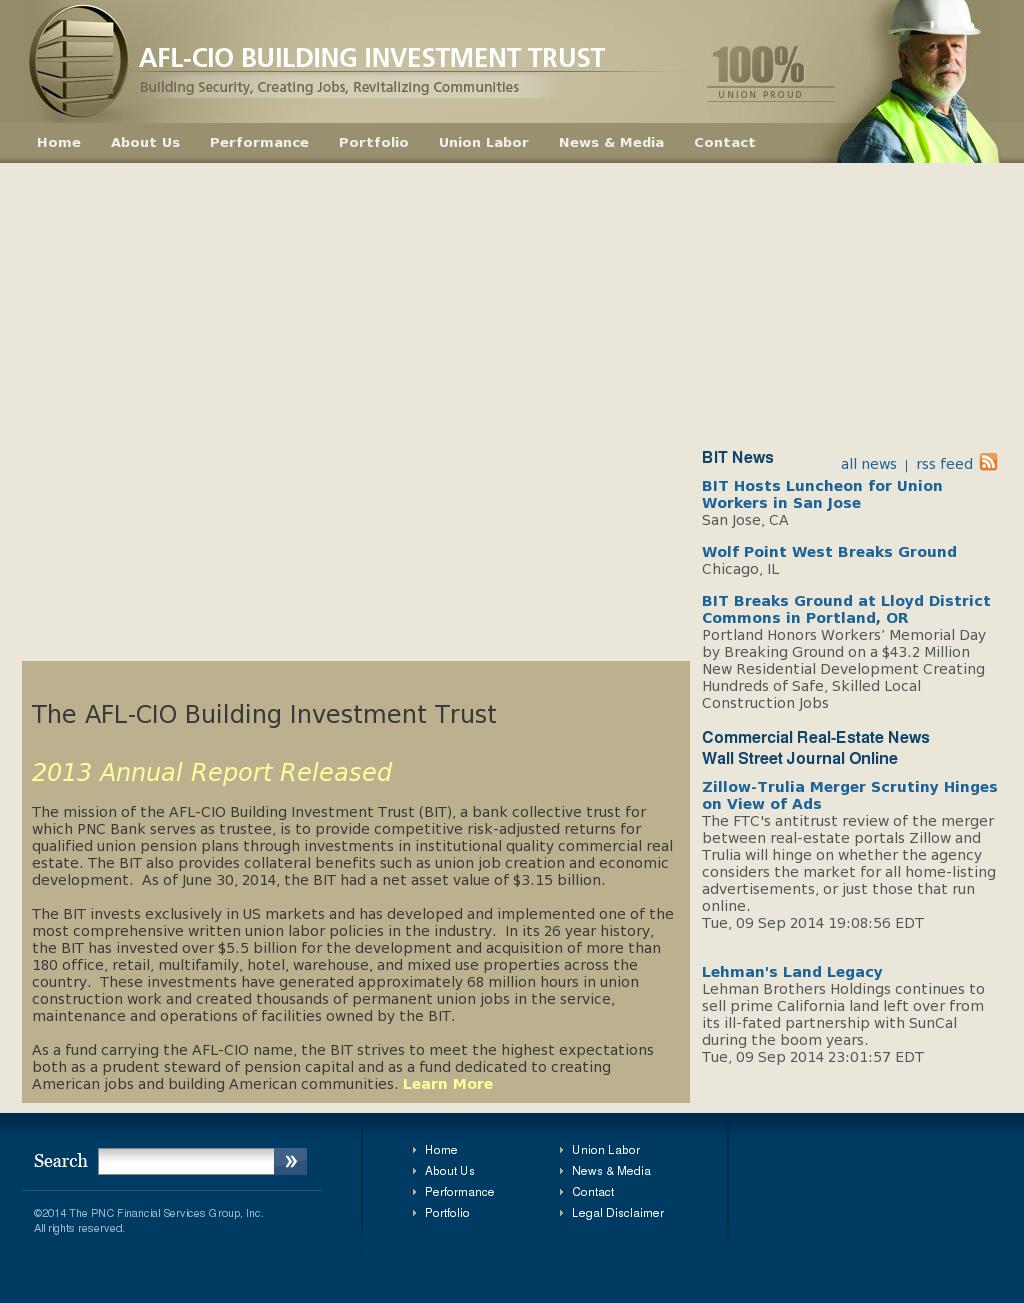 AFL-CIO Building Investment Trust Competitors, Revenue and Employees